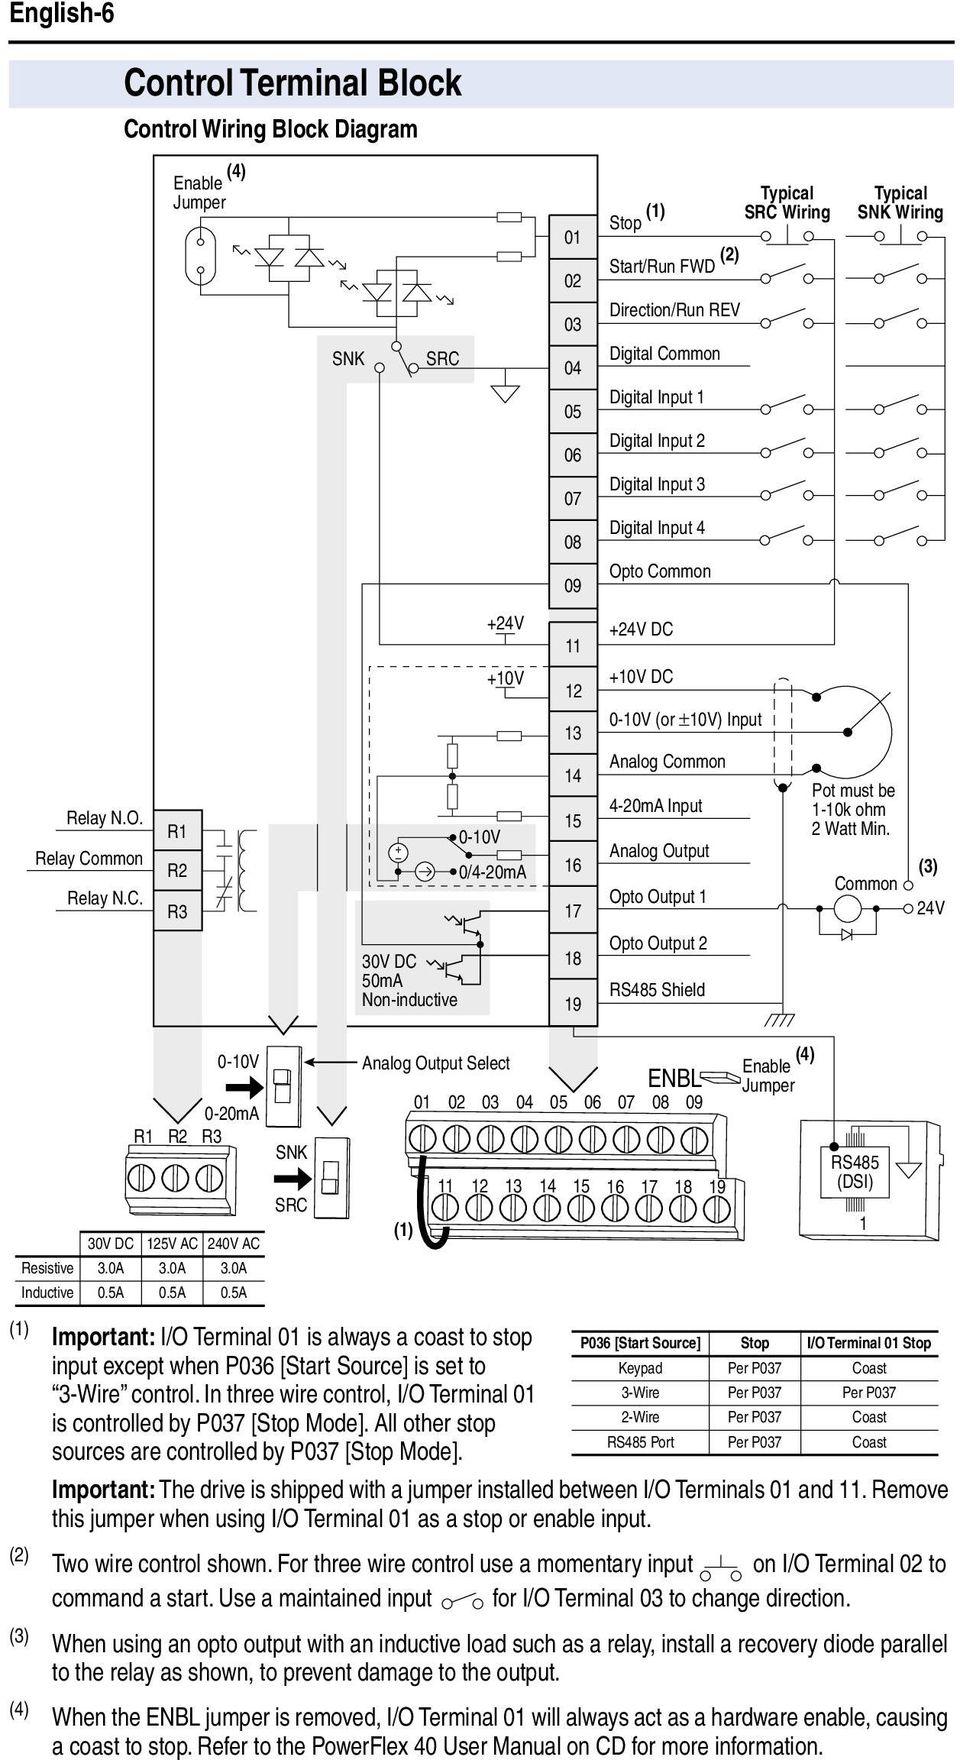 Wiring Diagram Internal Powerflex 700 : Powerflex 700